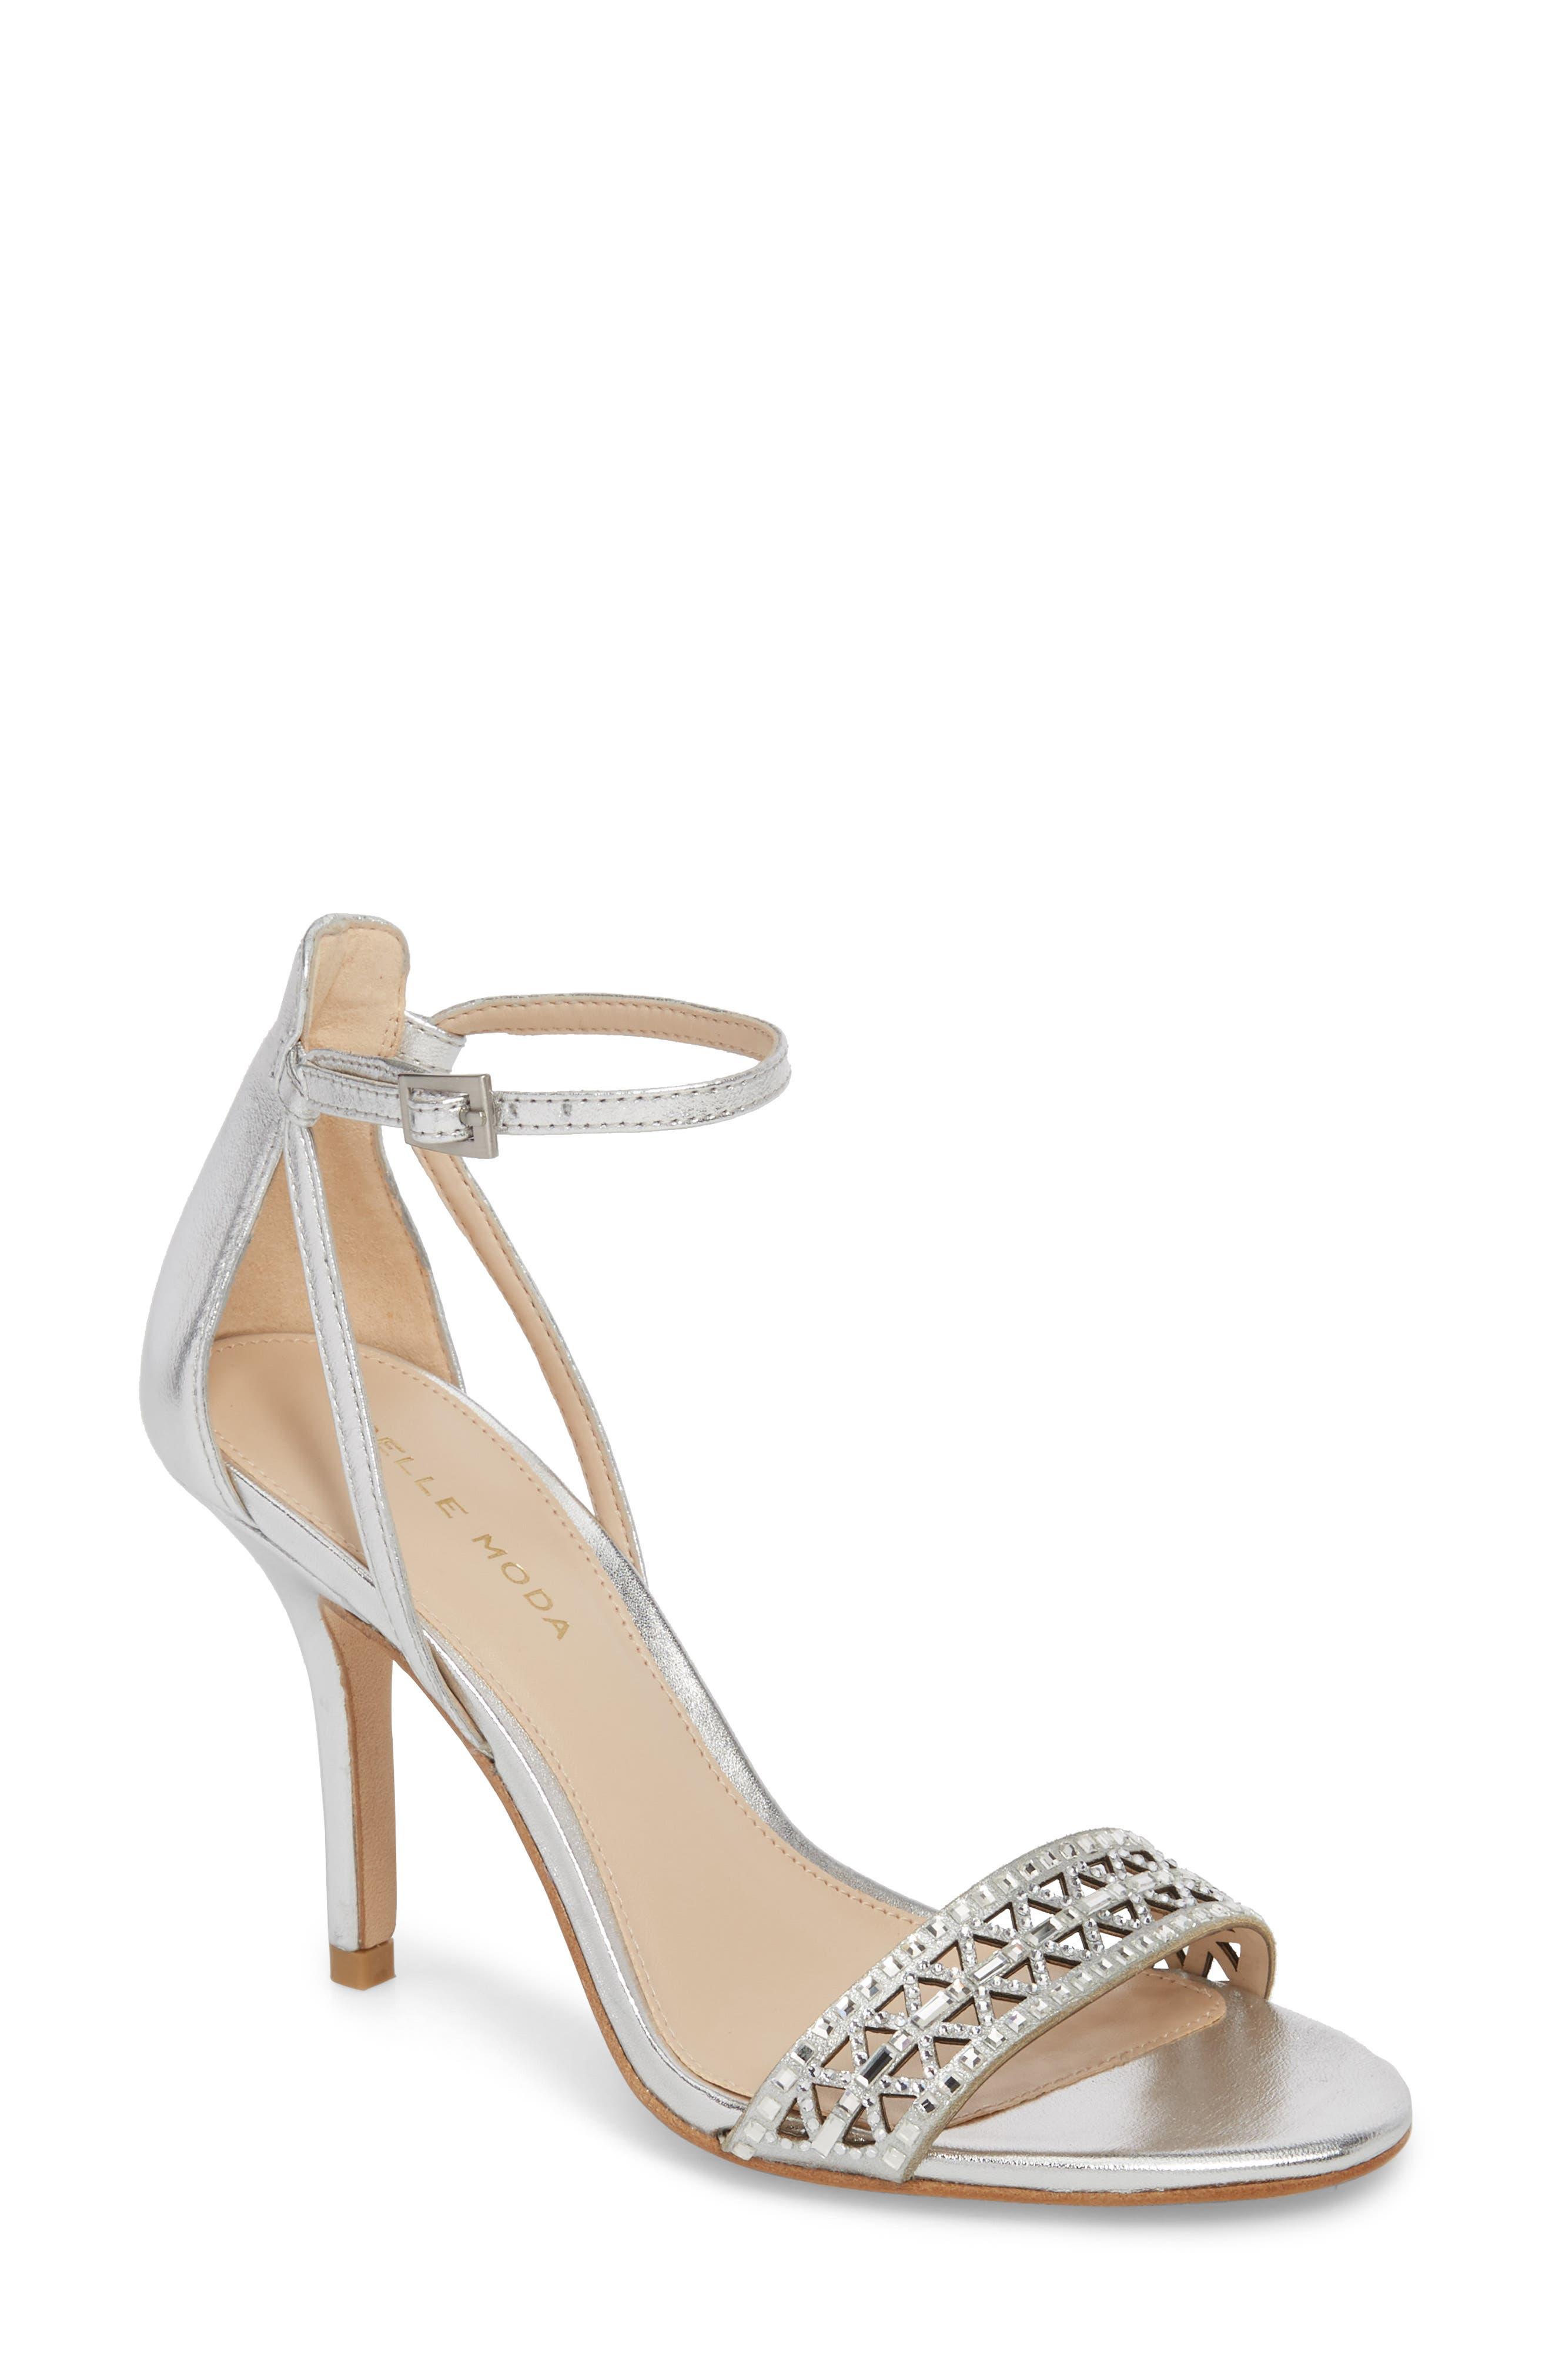 PELLE MODA Women's Karmina Embellished Sandal